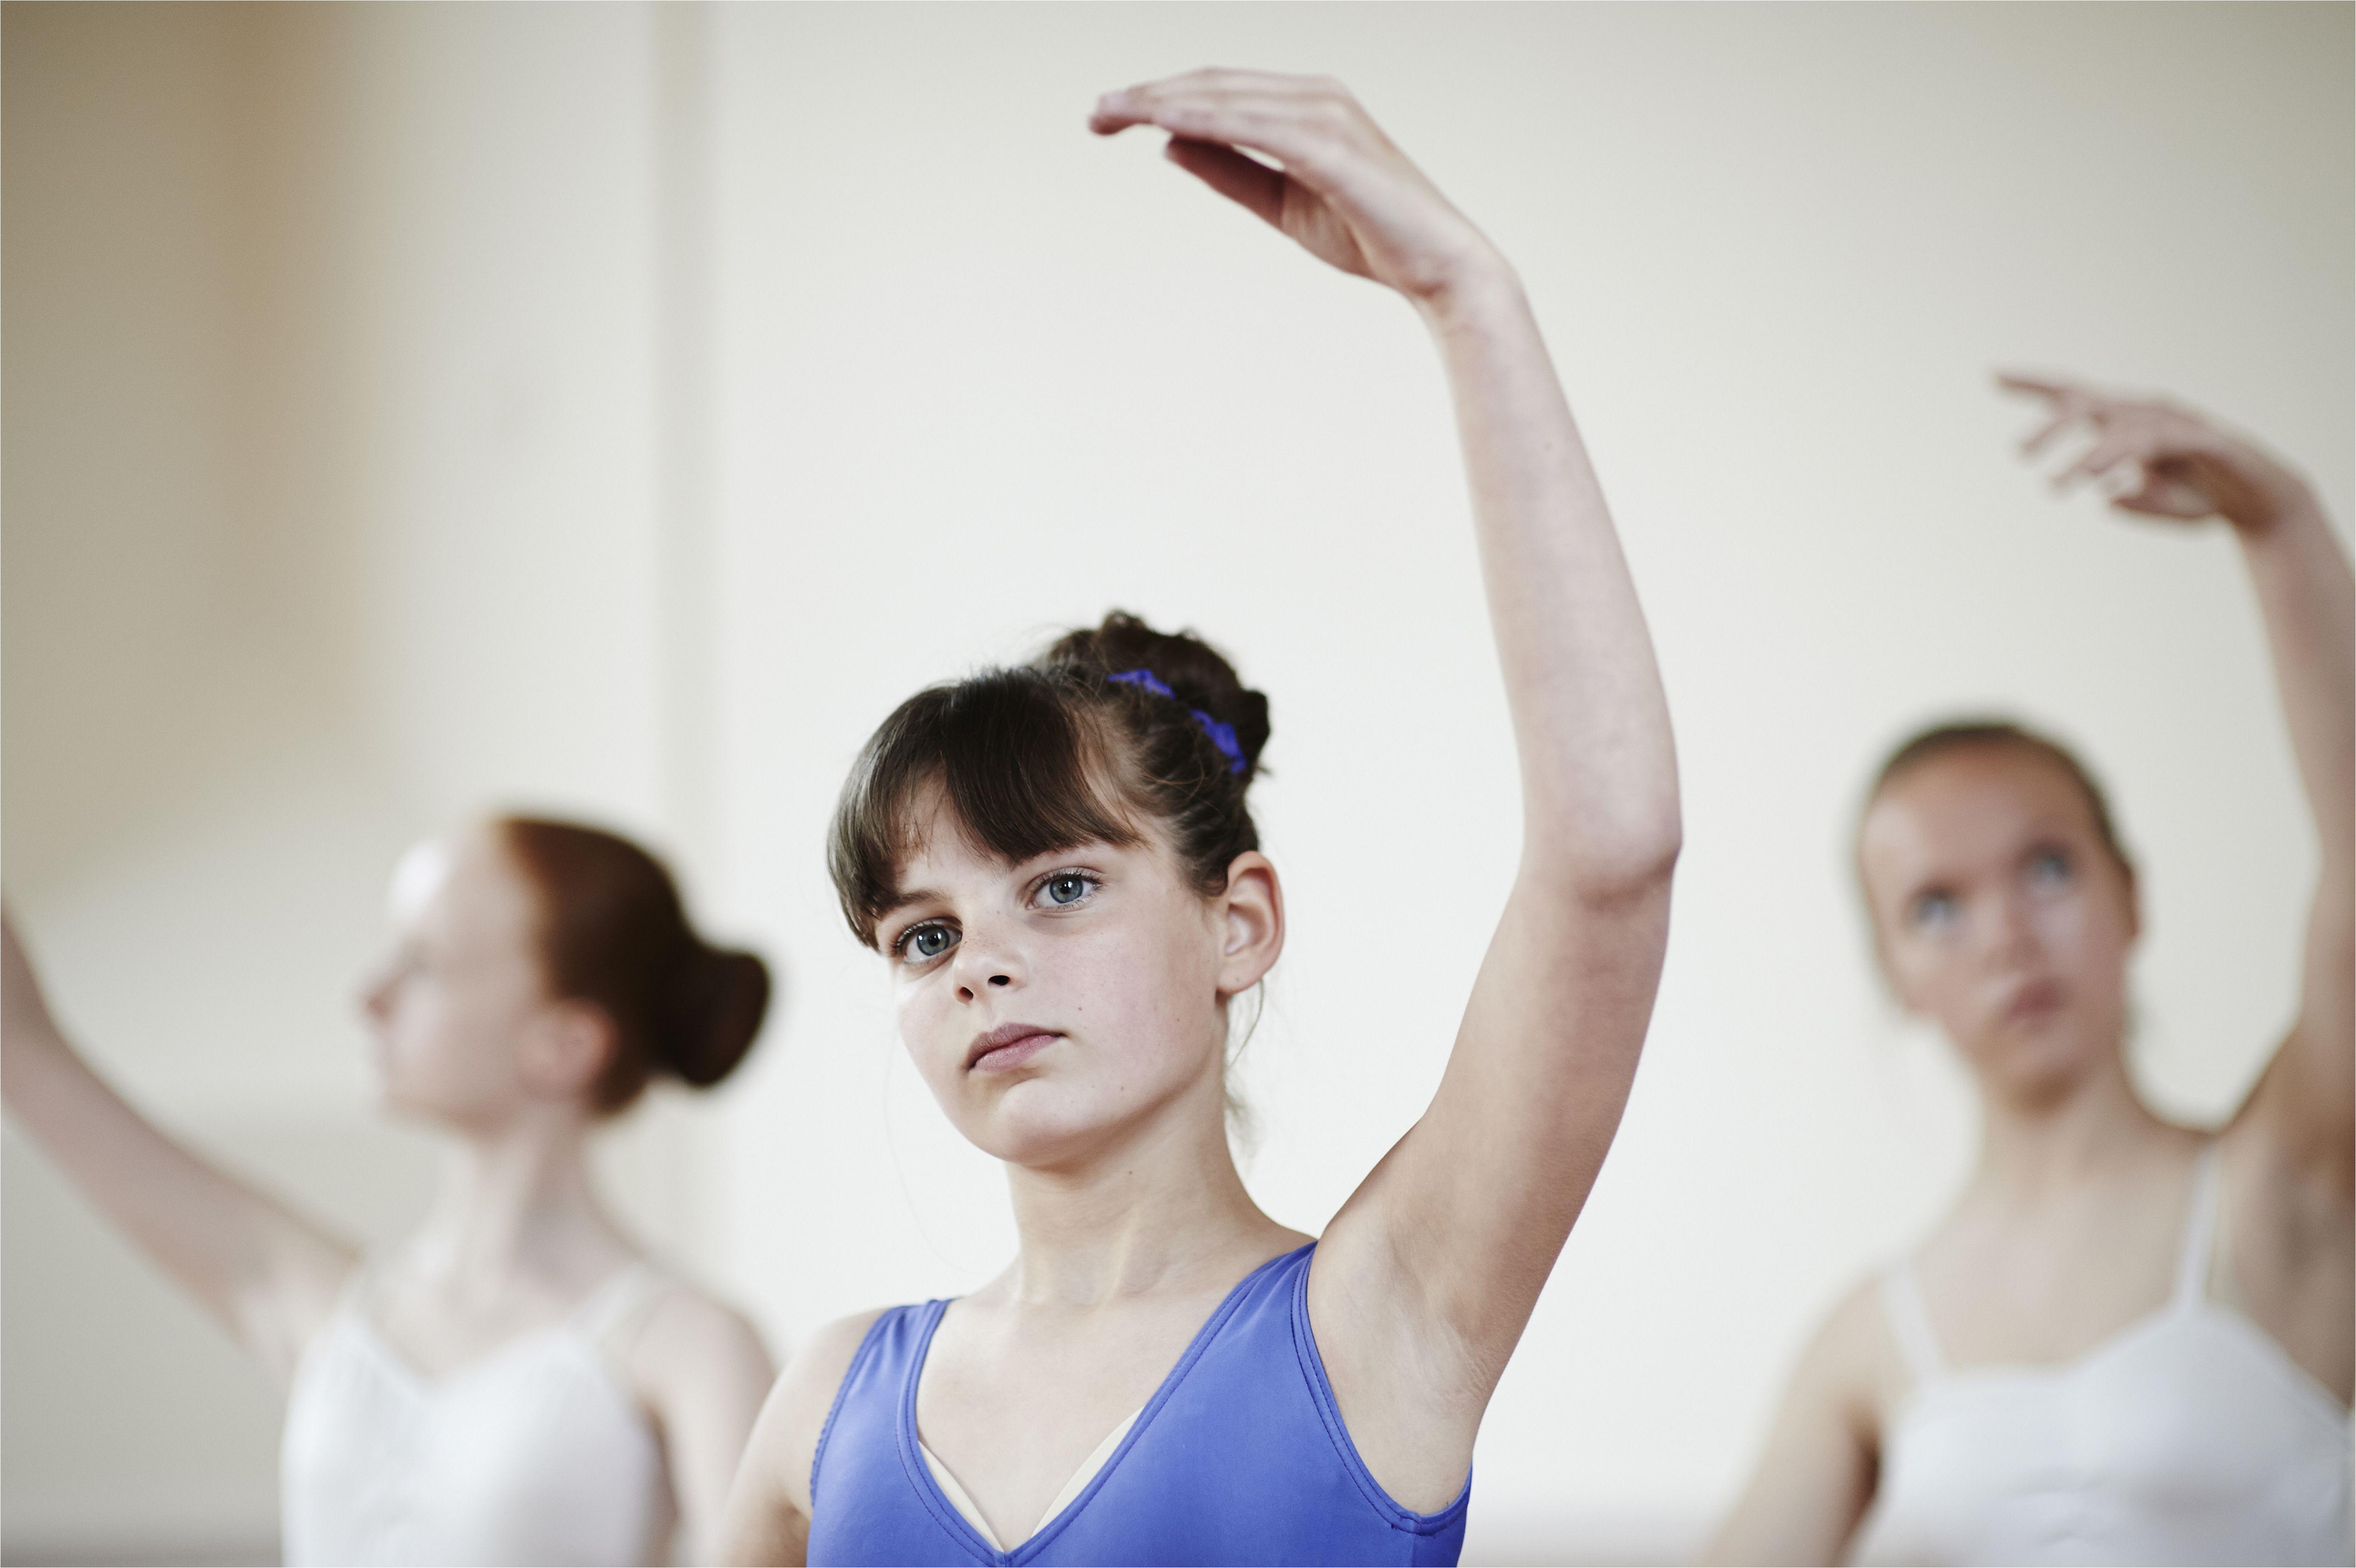 ballet dancers practising ballet pose 502369021 59f0cc7e0d327a00109b2746 jpg